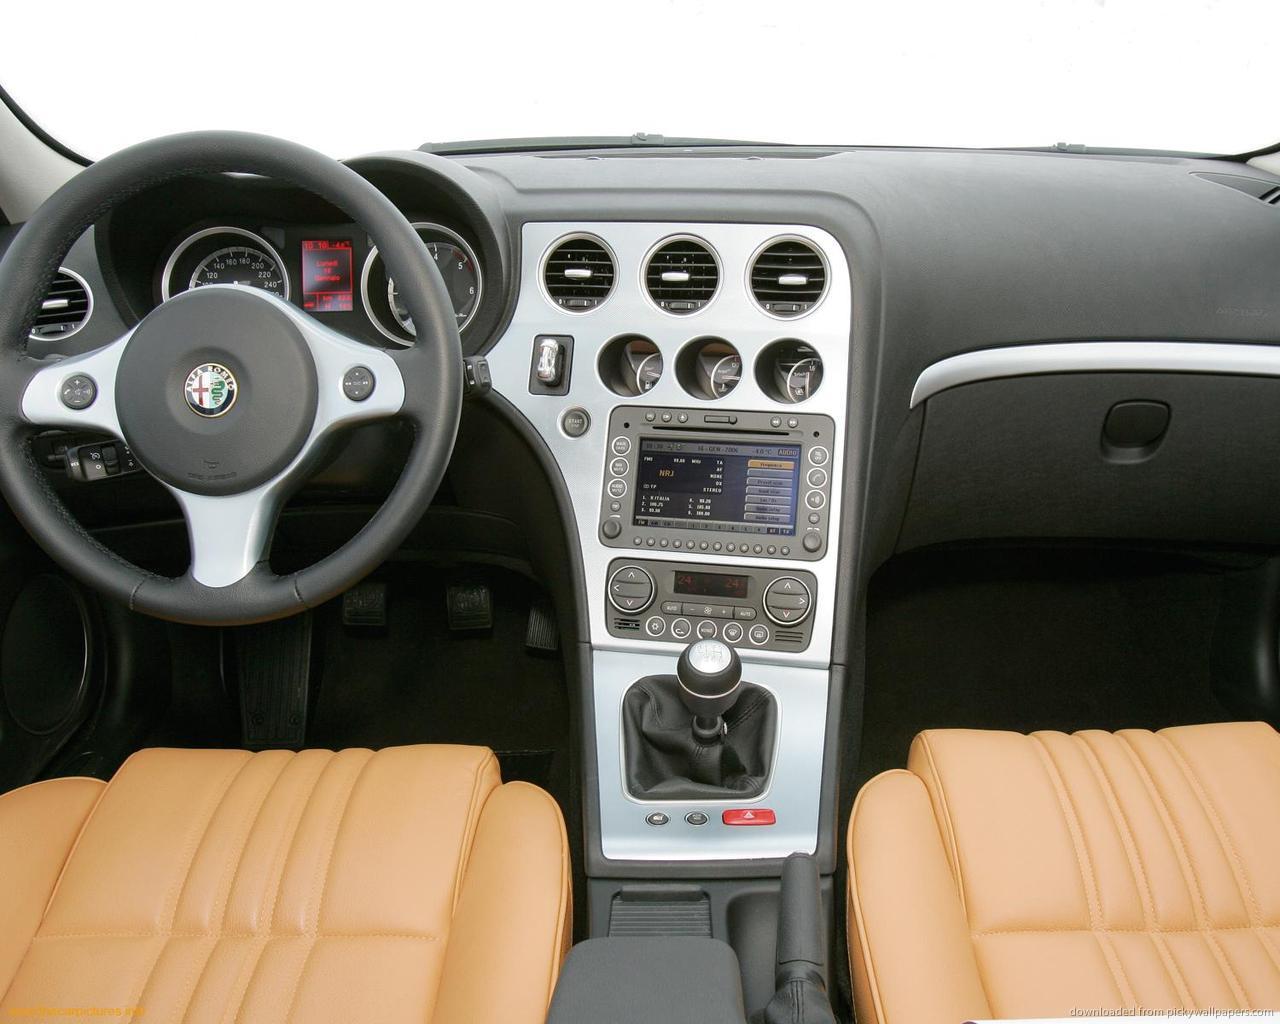 Alfa Romeo 159 Interior 1280x1024 Wallpaper Teahub Io